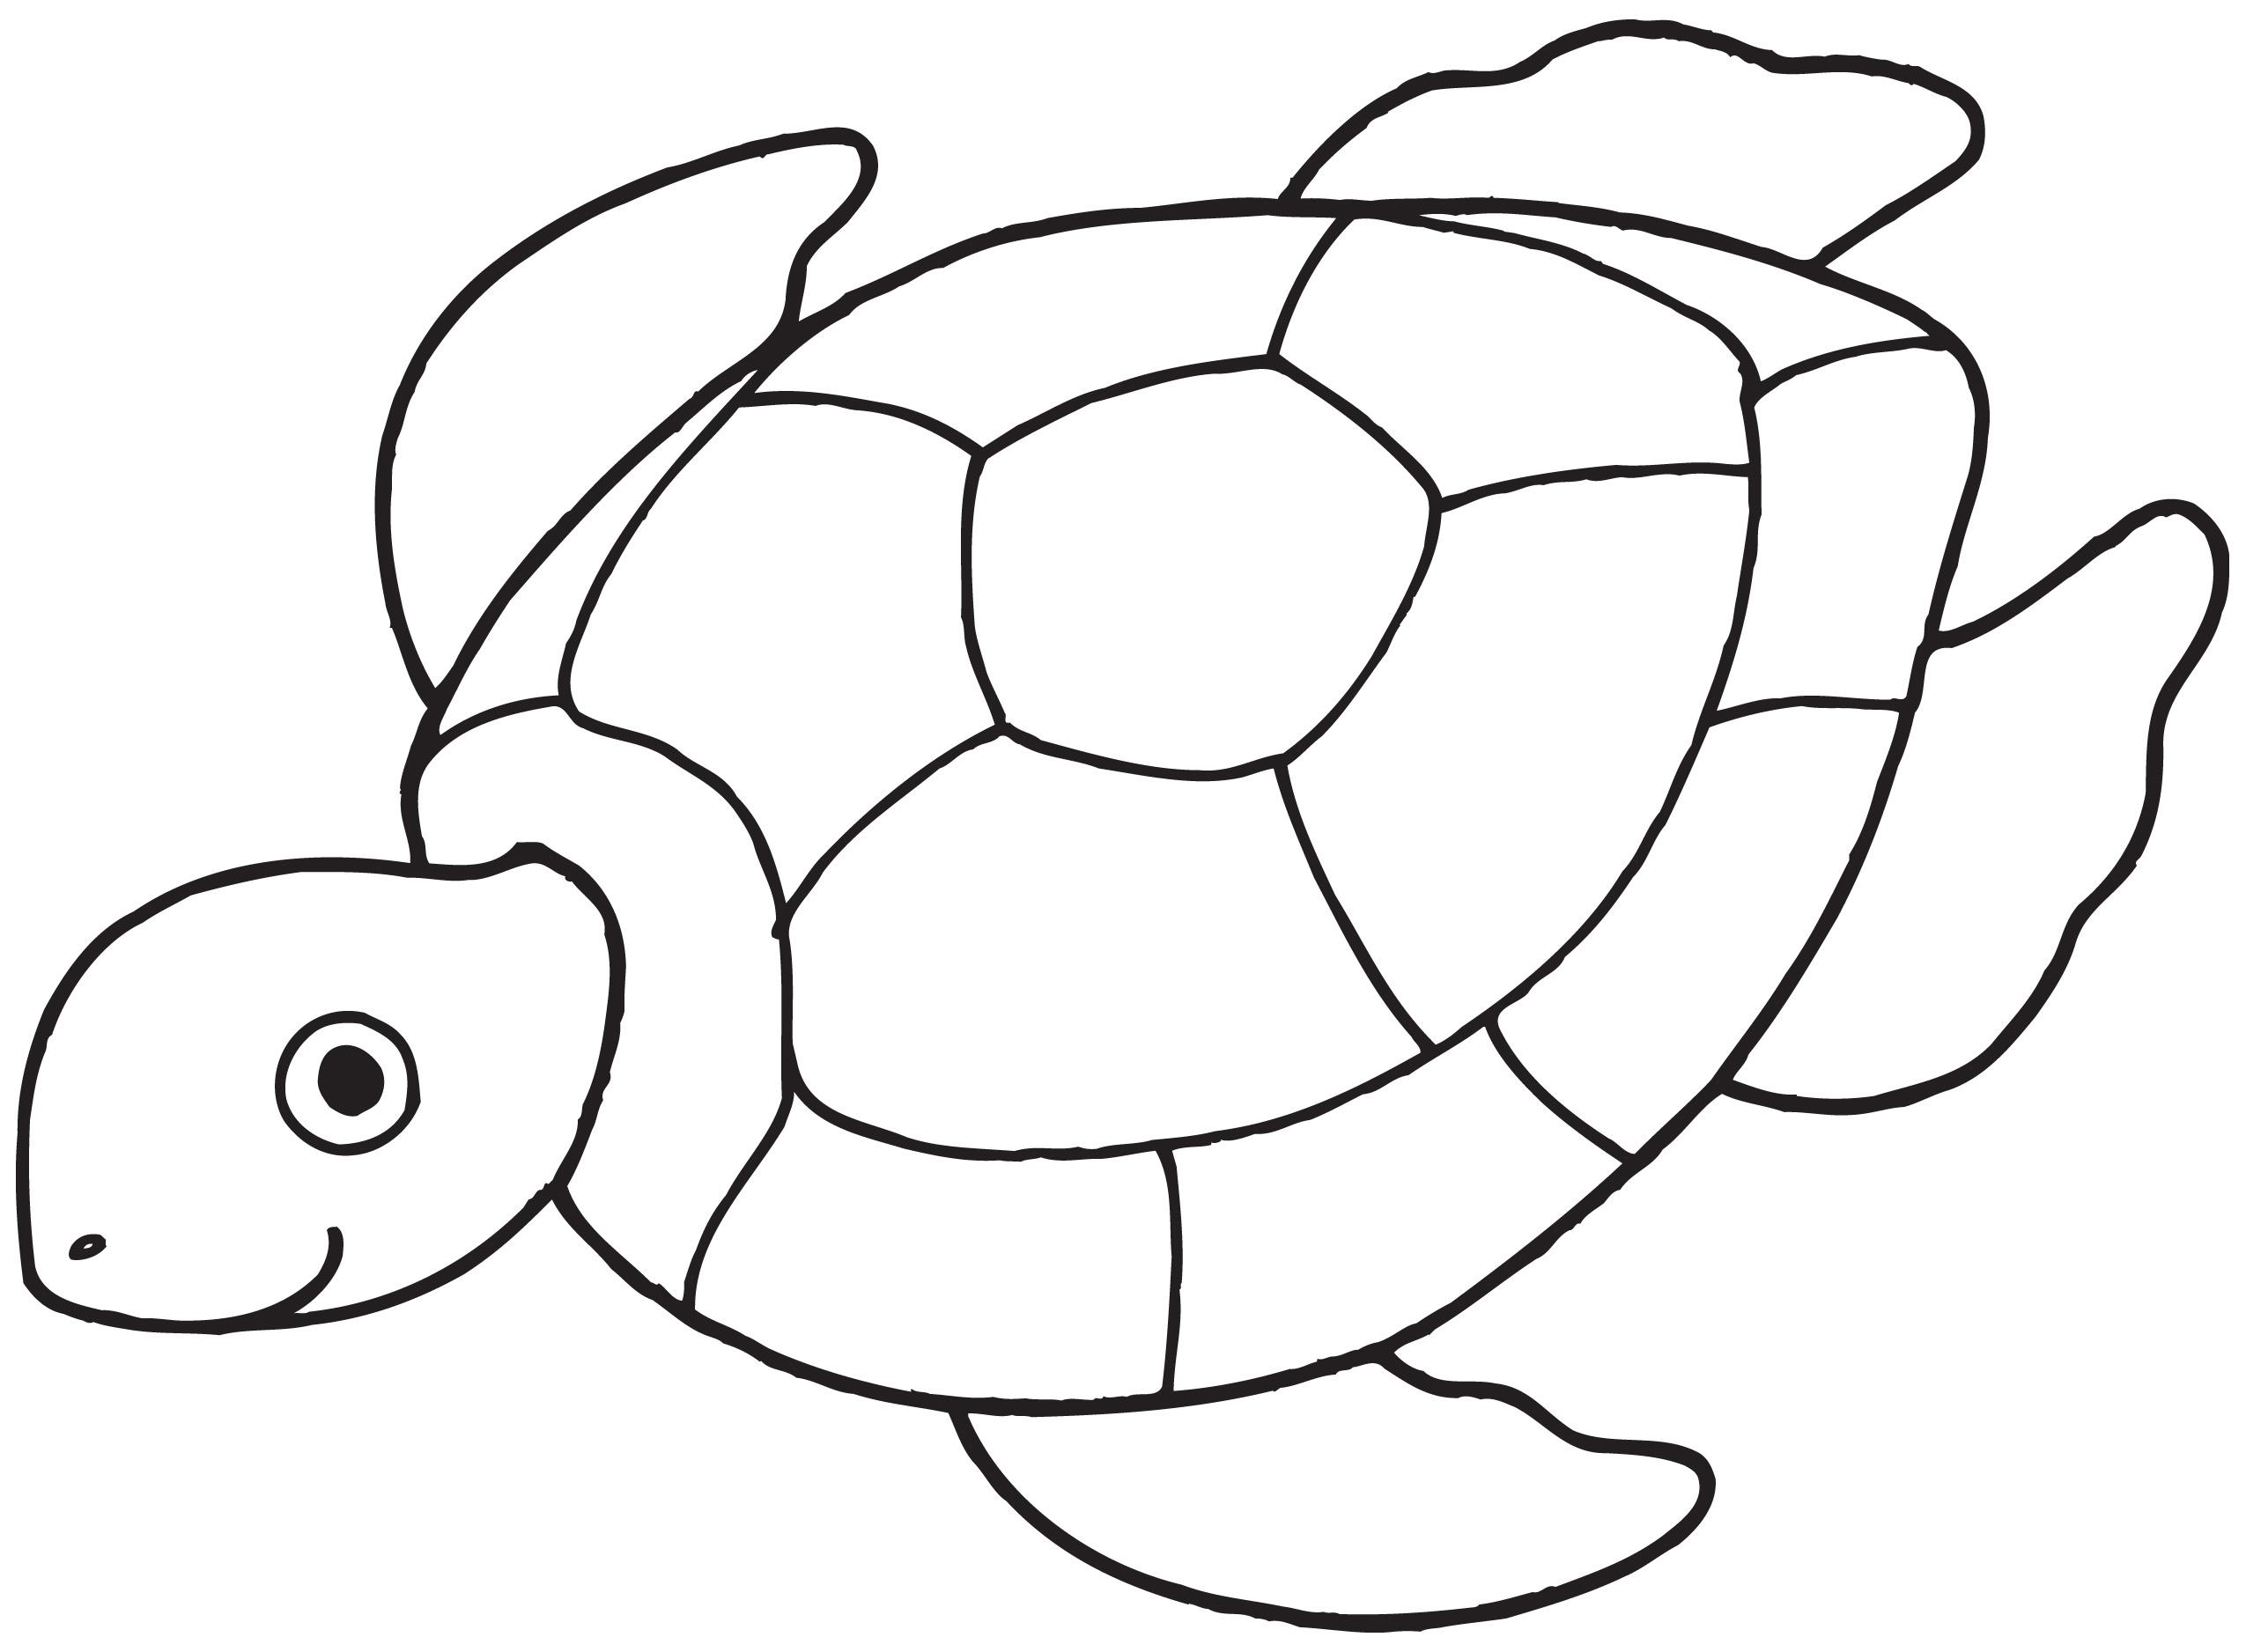 Hawaiian Sea Turtle Drawing at GetDrawings com | Free for